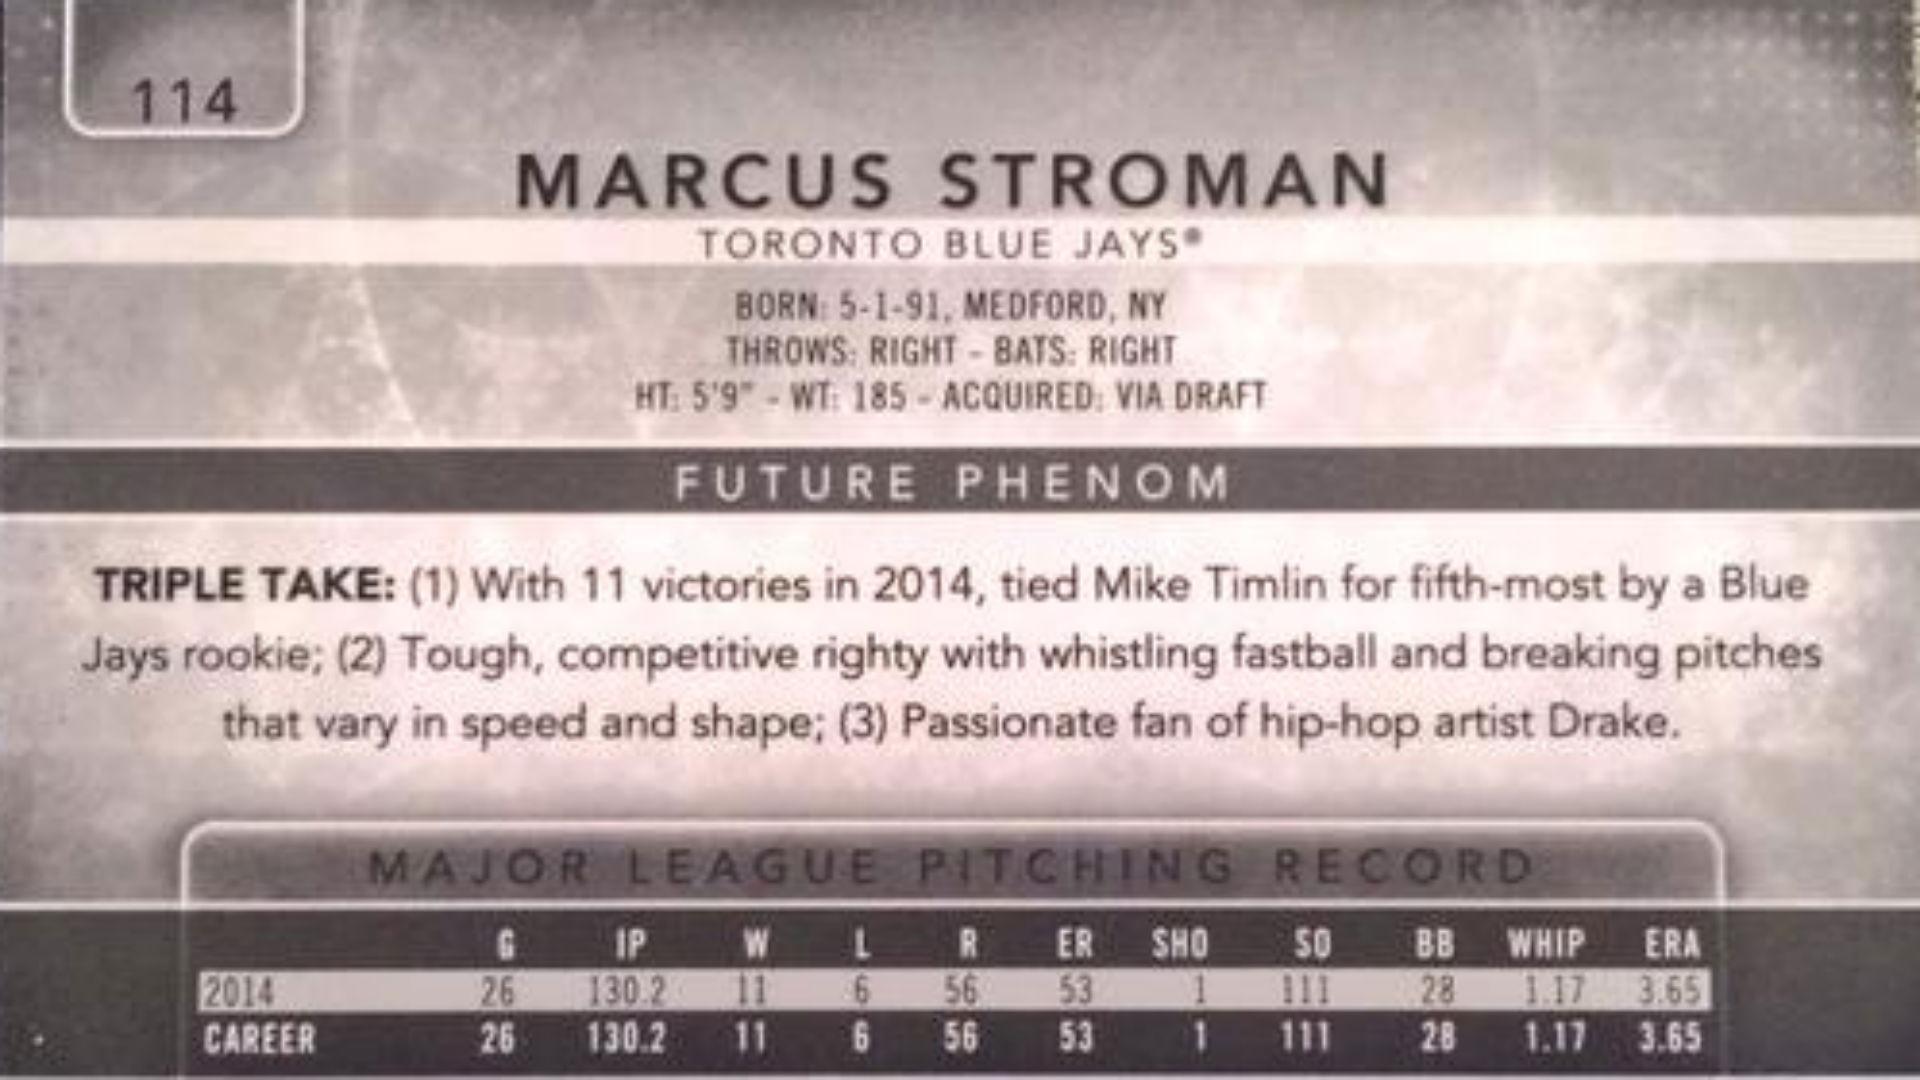 Marcus Stroman Drake Card FTR .jpg